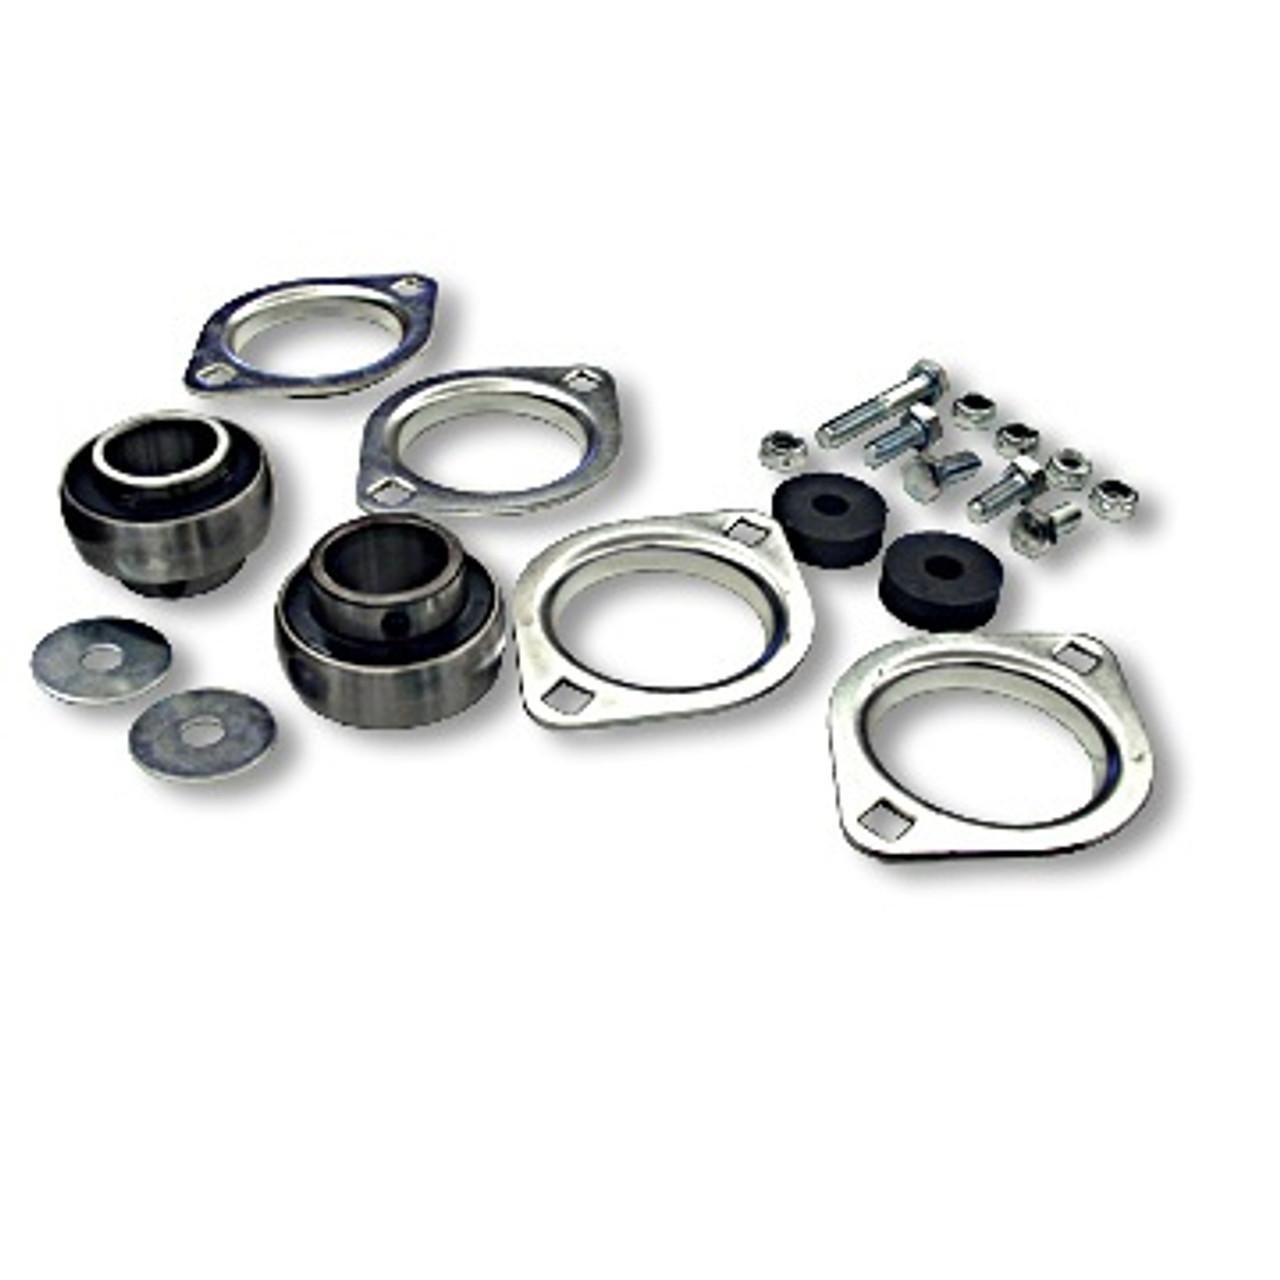 Hardware & Bearing Kit (Only) For Swing Mount